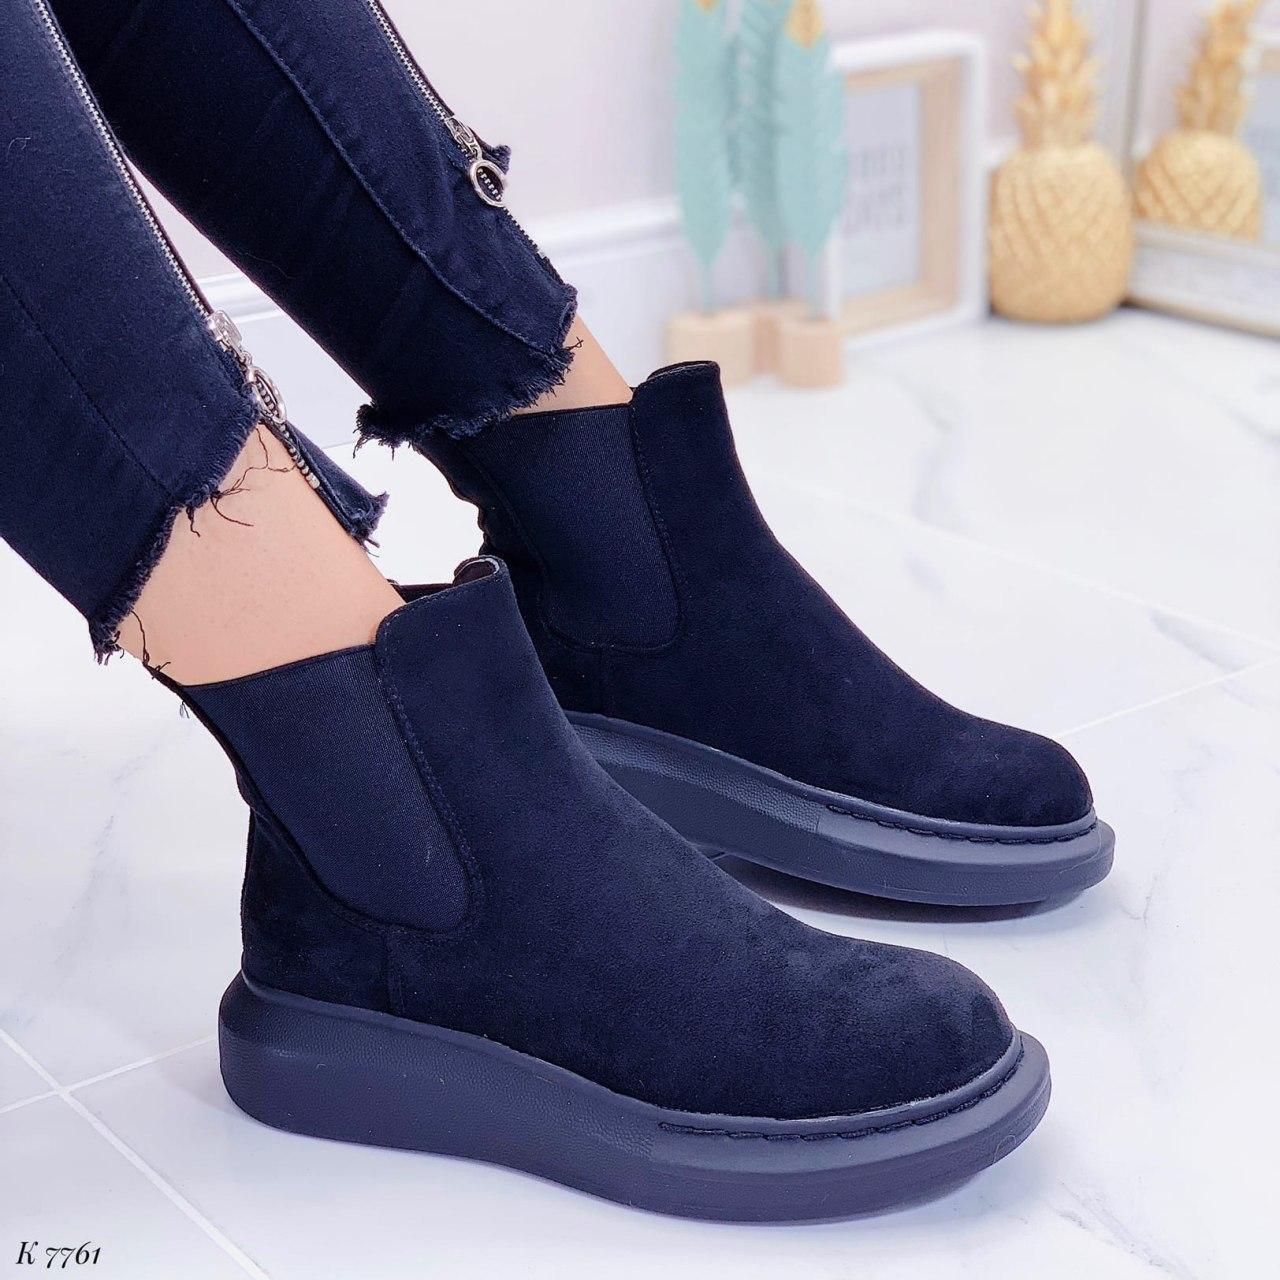 Ботинки женские черные, демисезонные из эко замши. Черевики жіночі чорні з еко замші